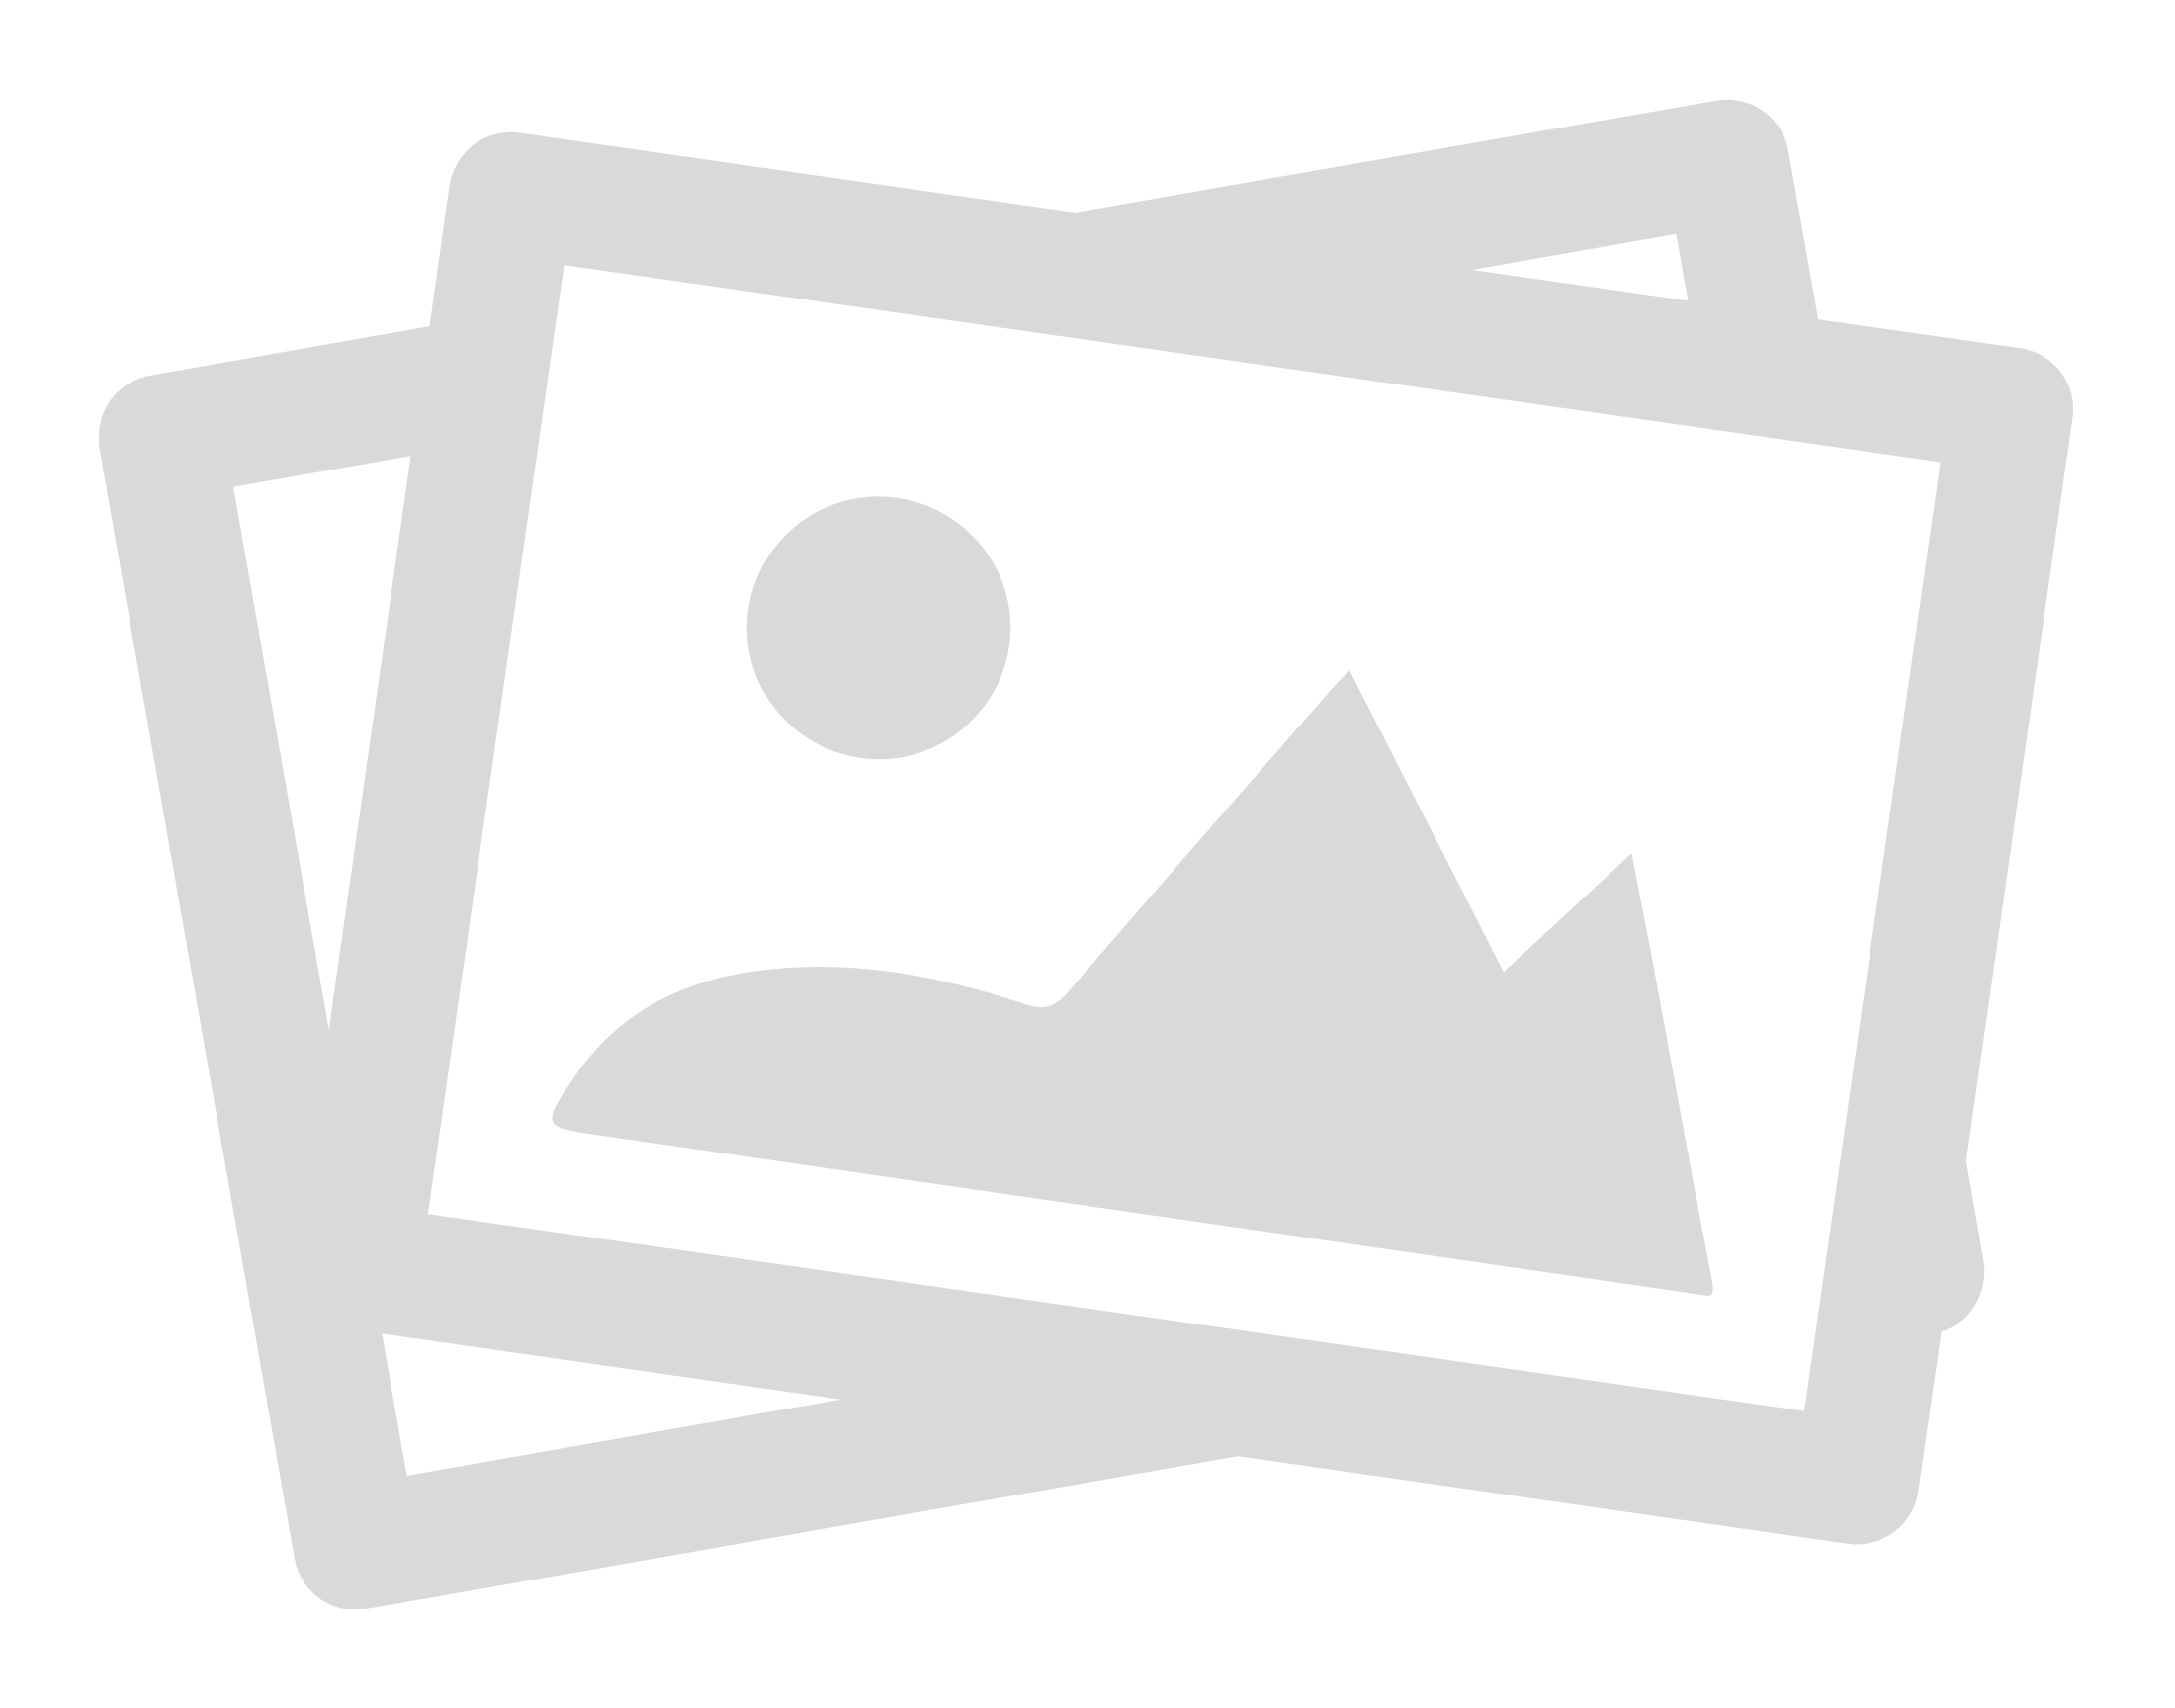 herGratis levering produkter TOPModelKøb de TOPModel smarte BoWrdxeC